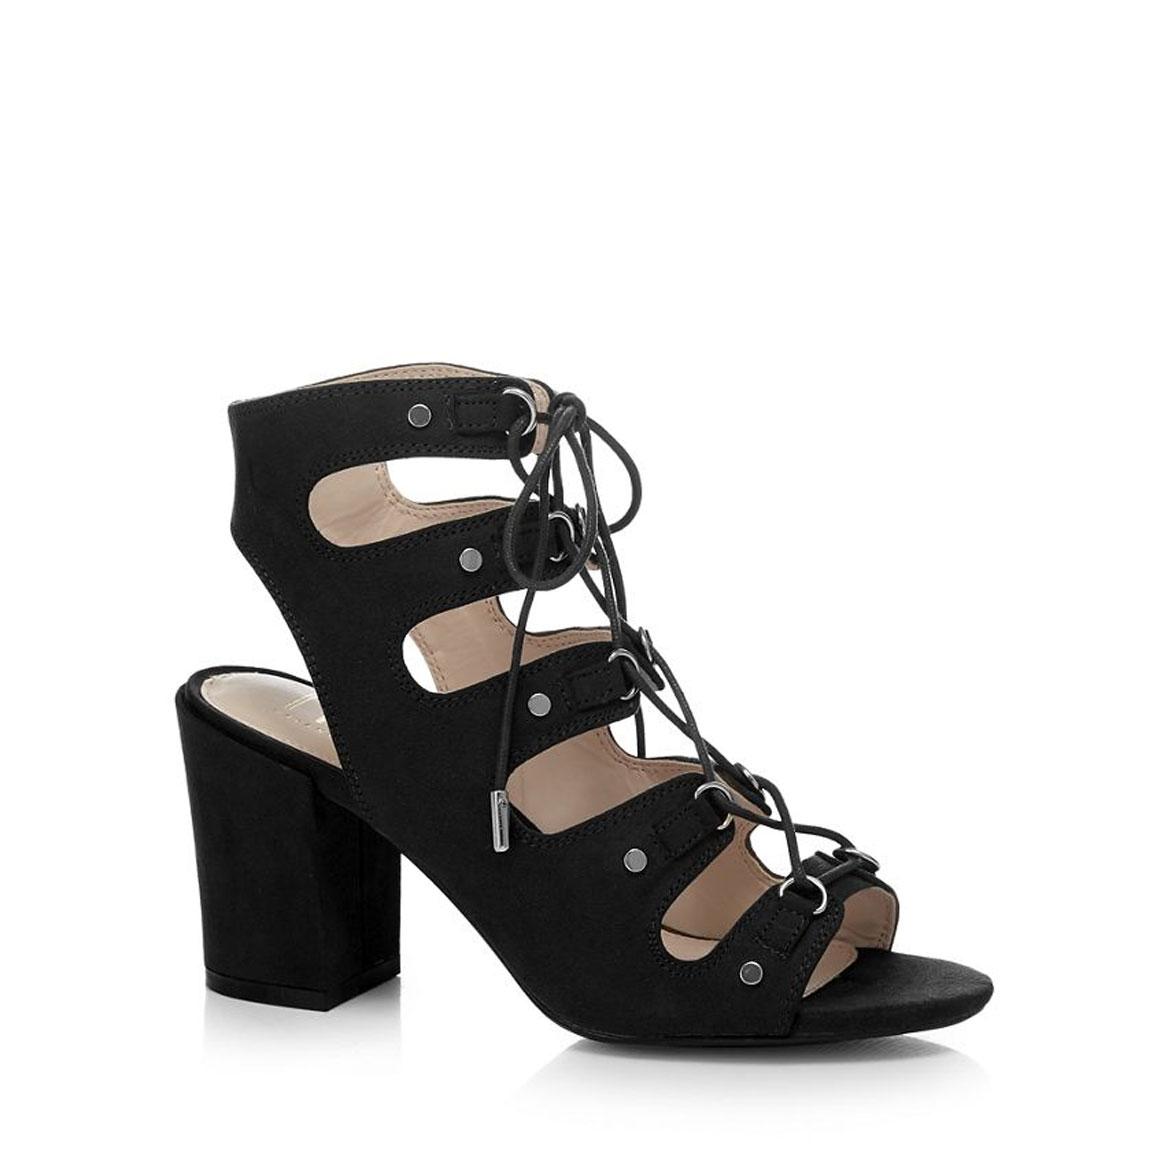 30ab2dff417 Details about Savannah Miller Sheeran Ghilie Womens Black Block Heel  Gladiator Sandal UK 5